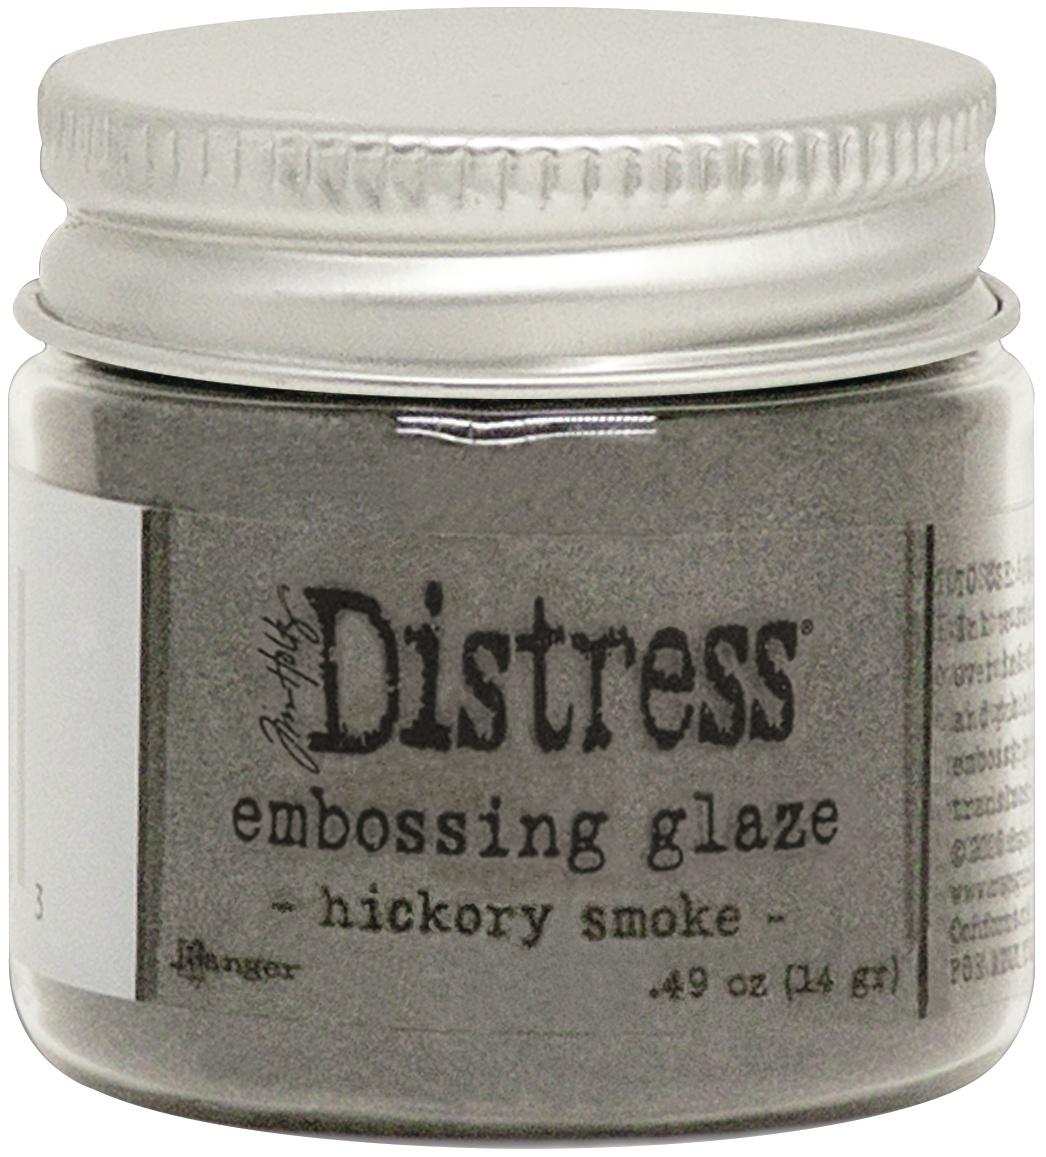 Tim Holtz Distress Embossing Glaze -Hickory Smoke